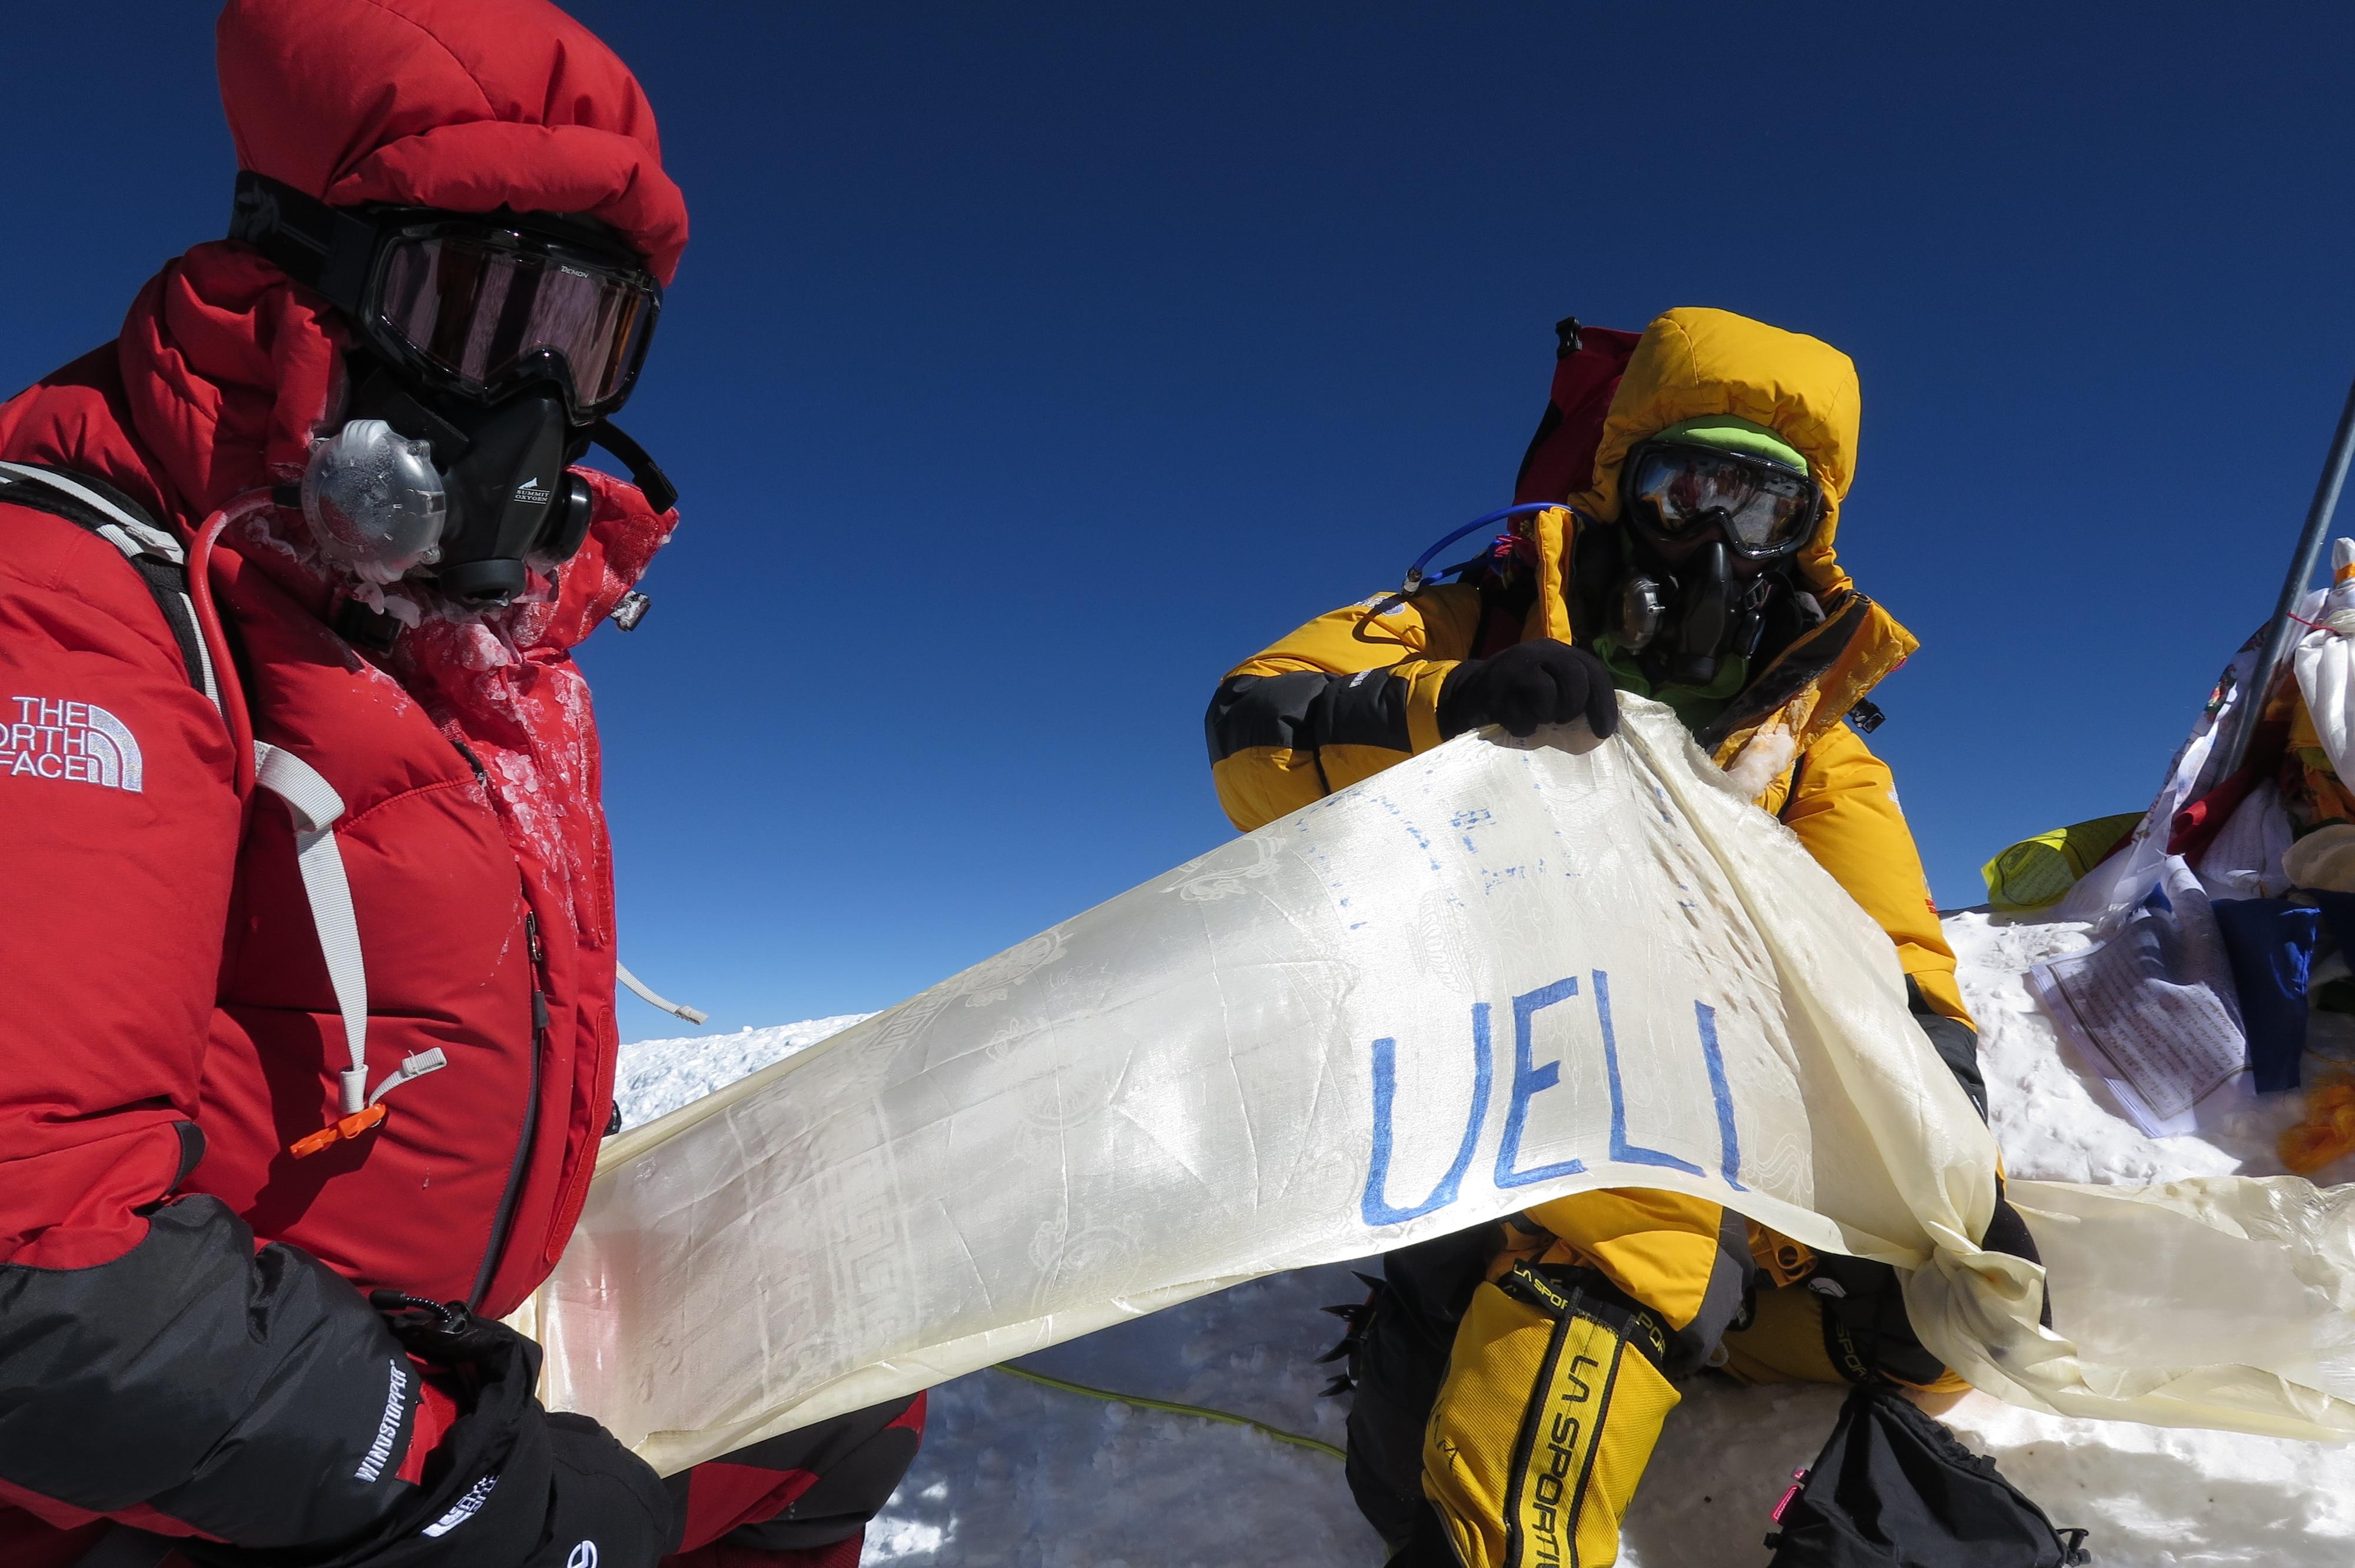 Photo of Il Mio Everest: UELI